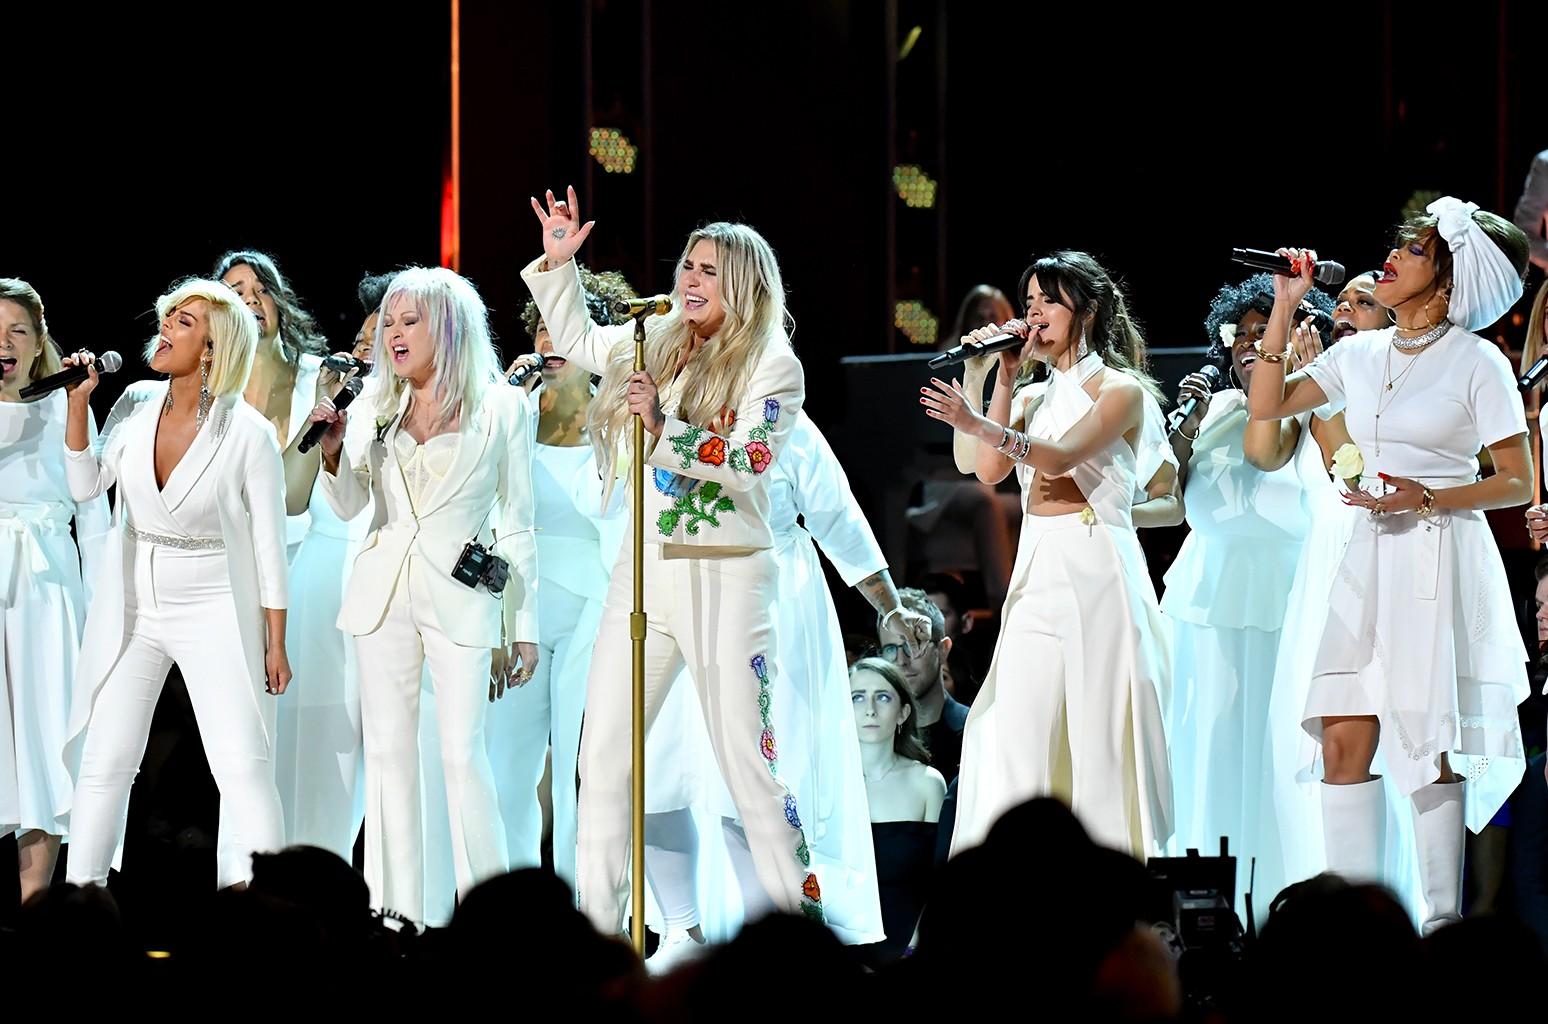 Bebe Rexha, Cyndi Lauper, Kesha, Camila Cabello and Andra Day